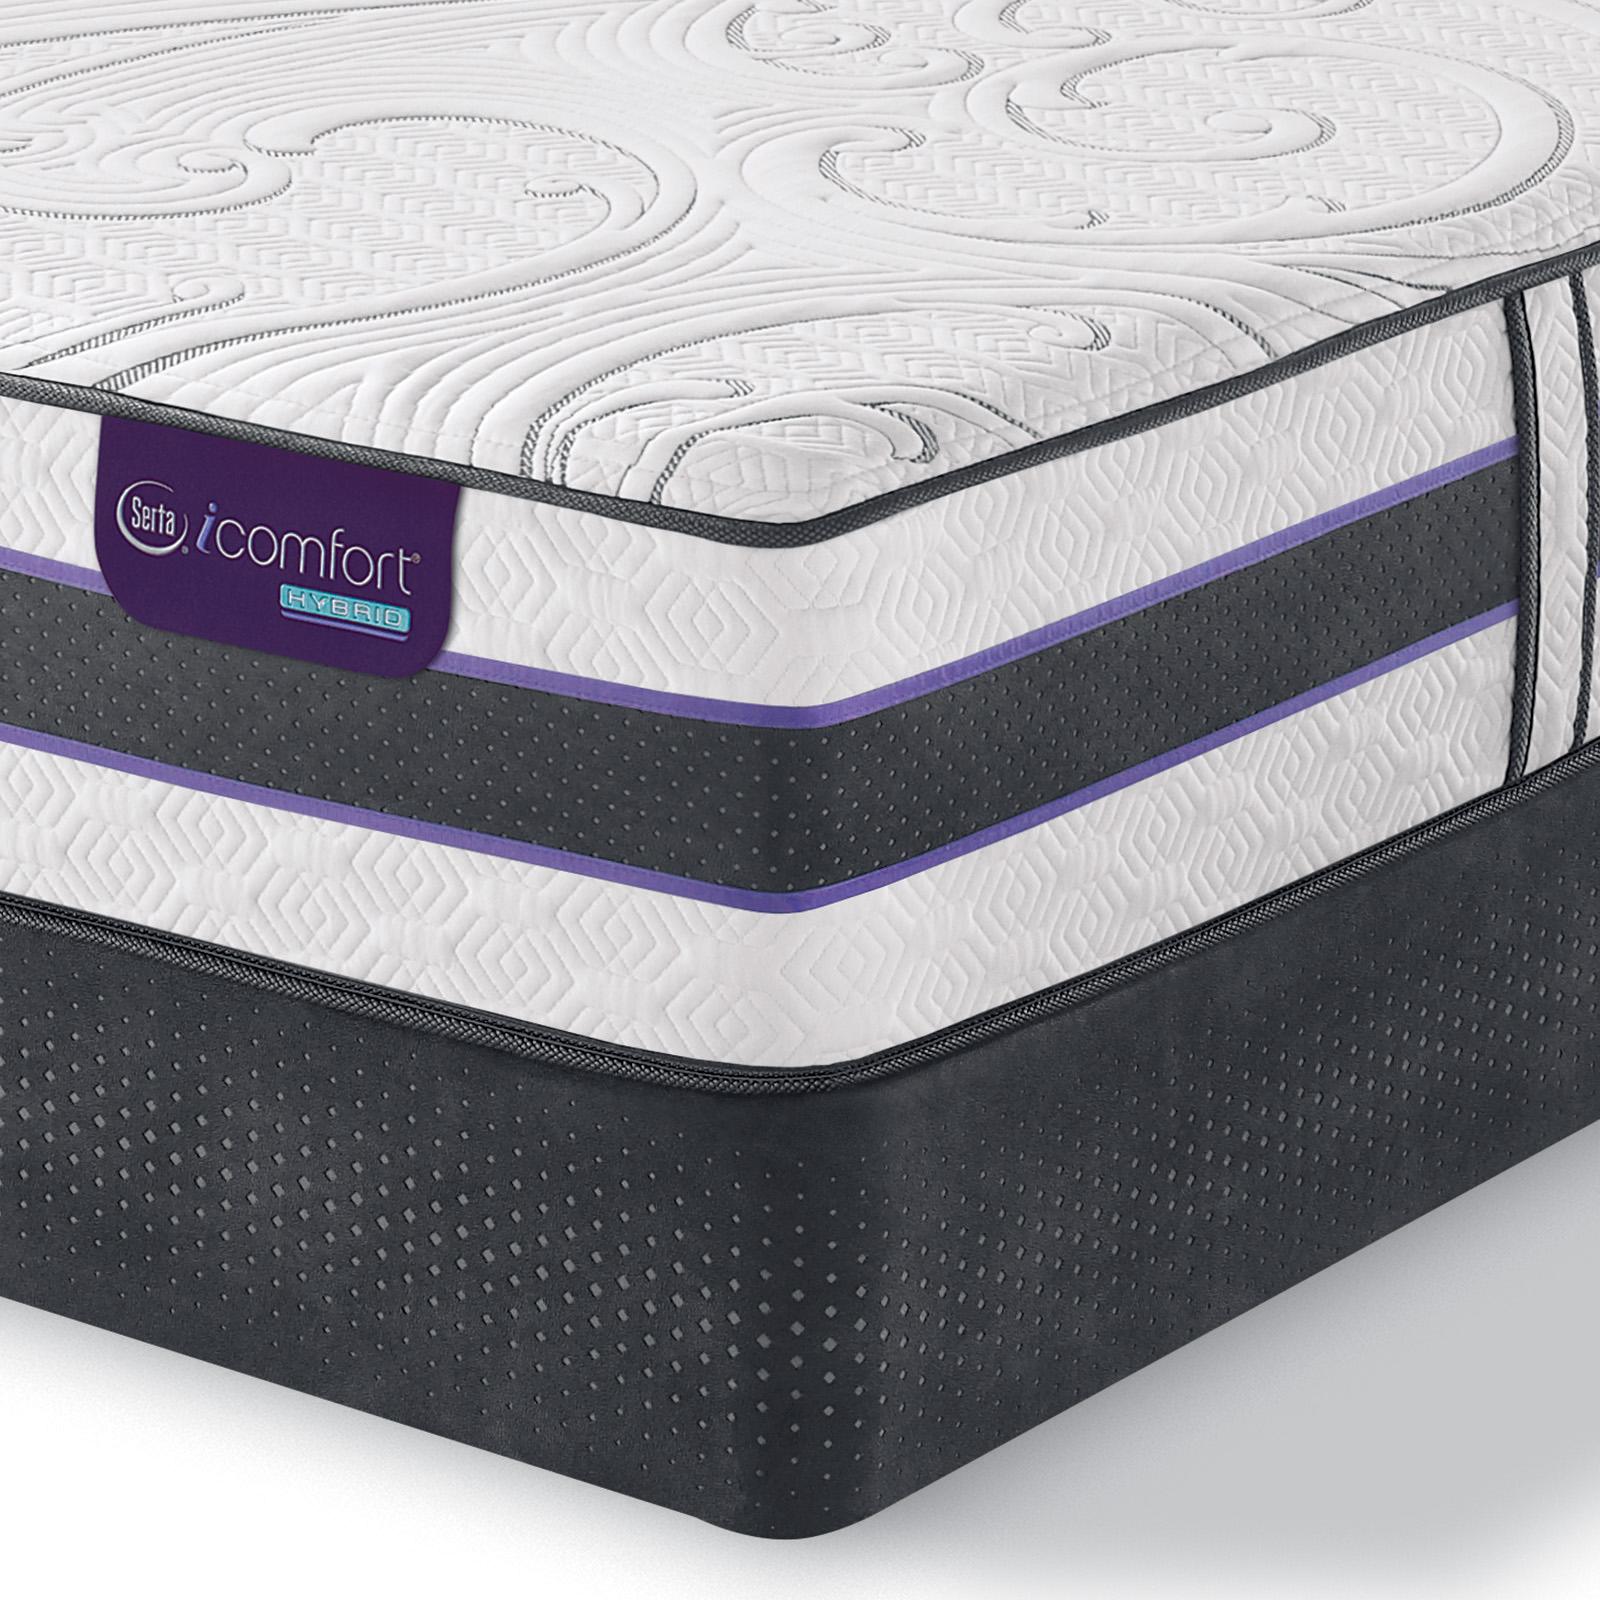 Serta Icomfort Hybrid Smartsupport Hb500s California King Mattress - Home Mattresses